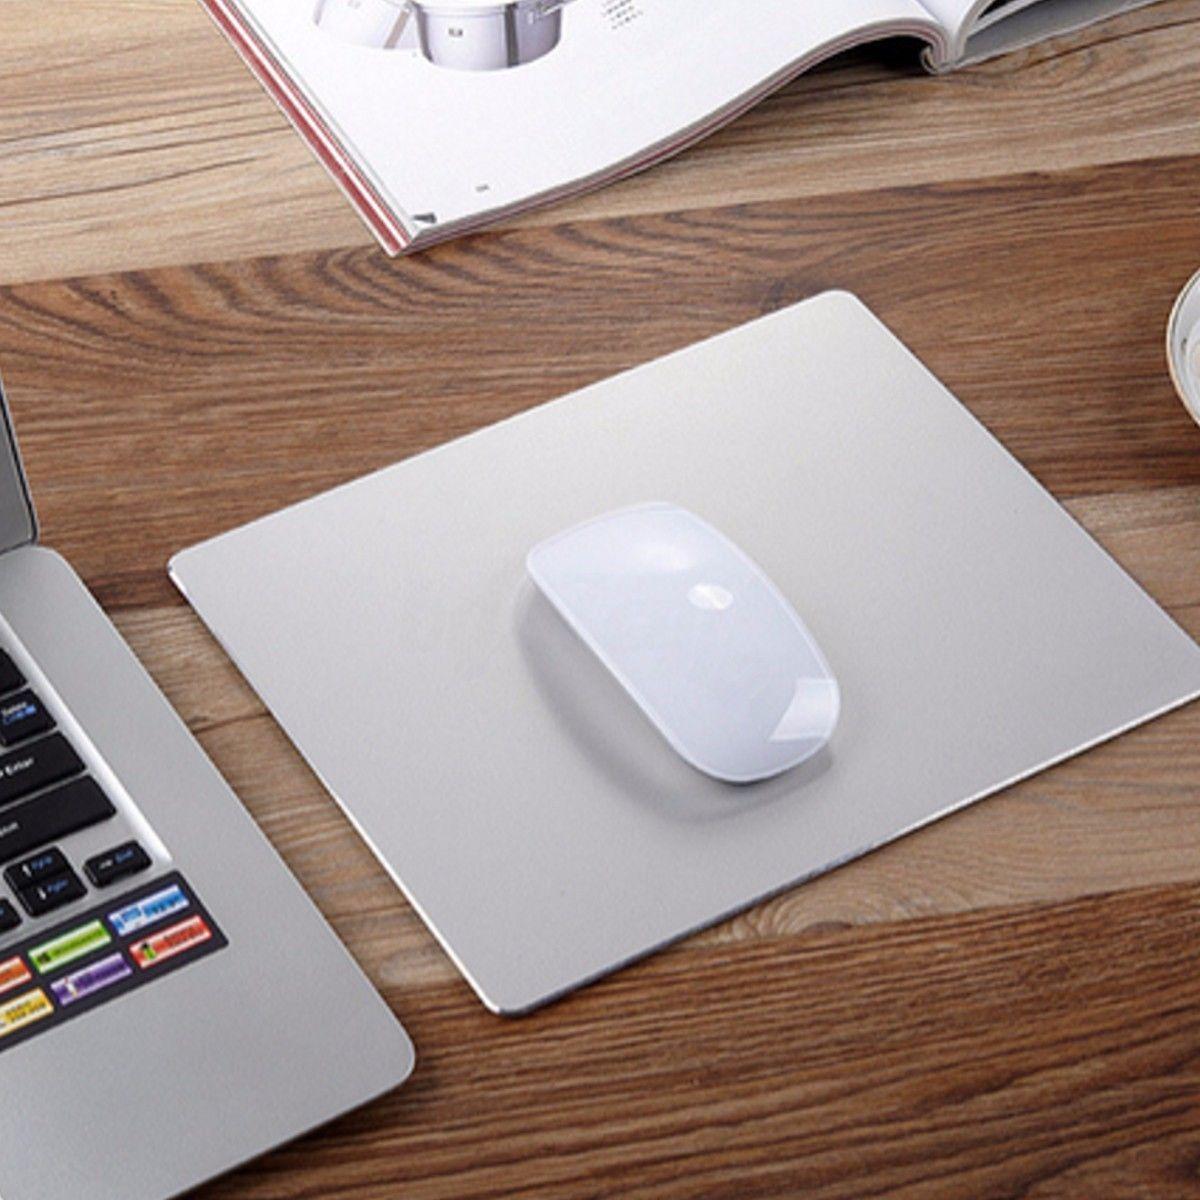 Mouse Mat Aluminum Gaming Pad Macbook Apple ASUS Dell Lenovo PC Laptop Mousepad